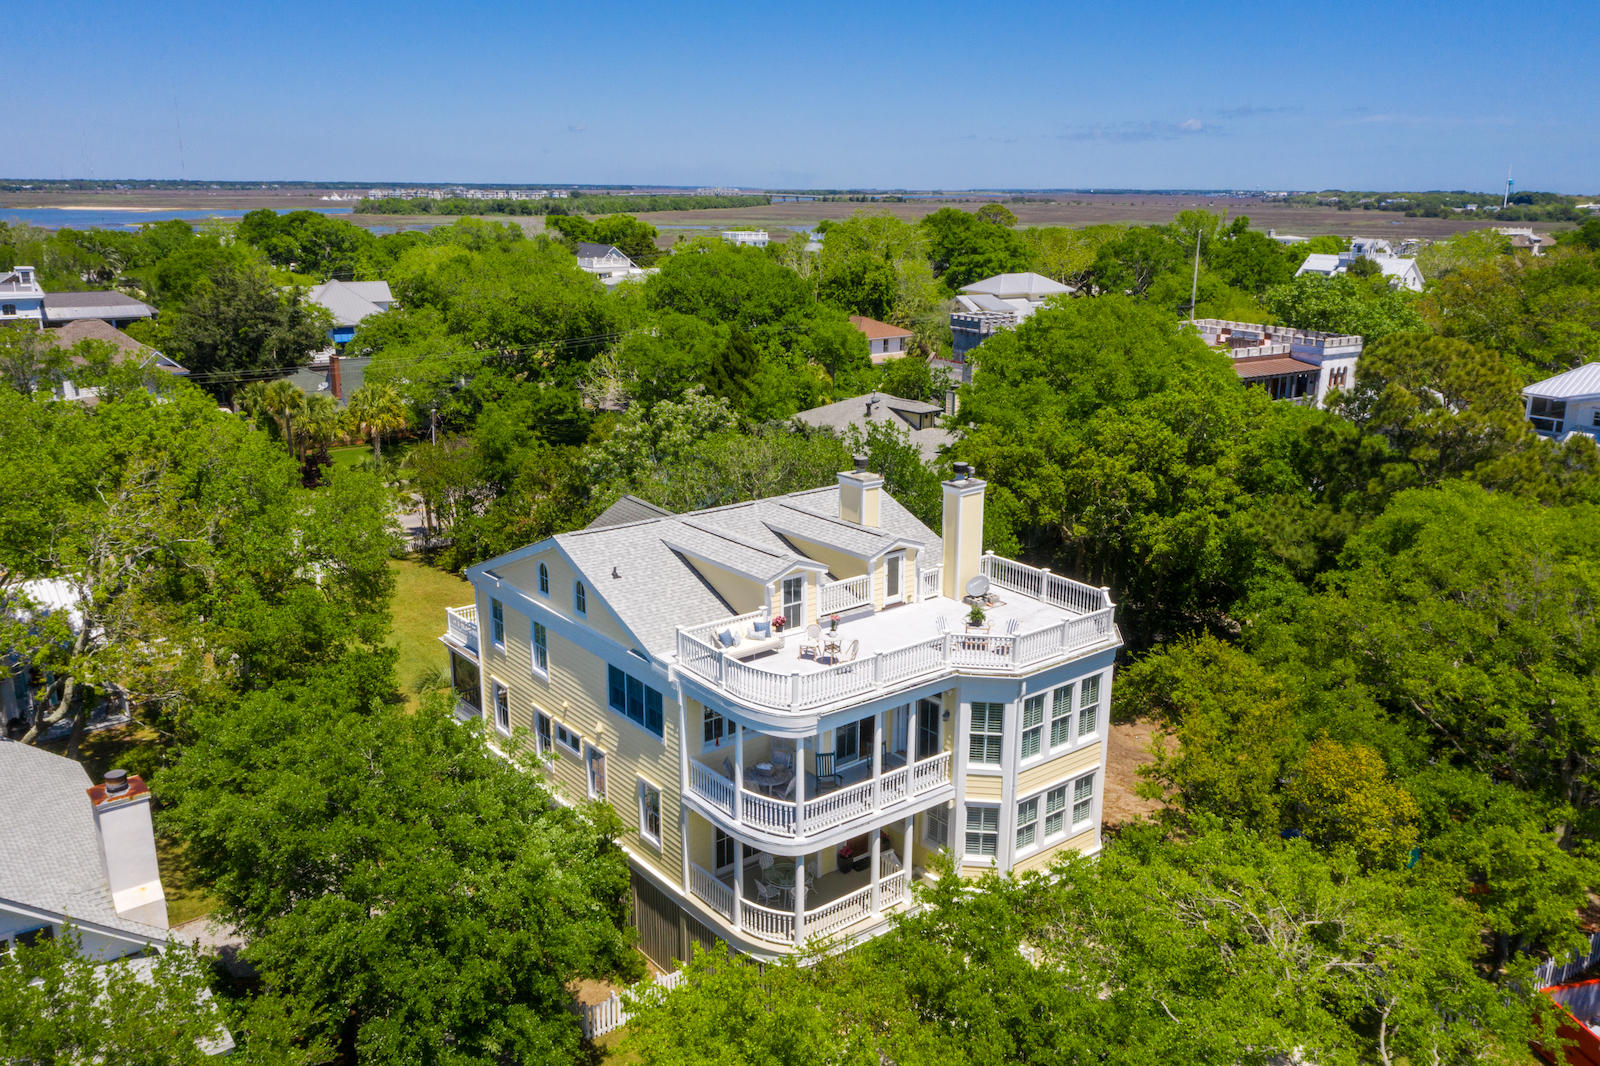 Sullivans Island Homes For Sale - 1318 Poe, Sullivans Island, SC - 14